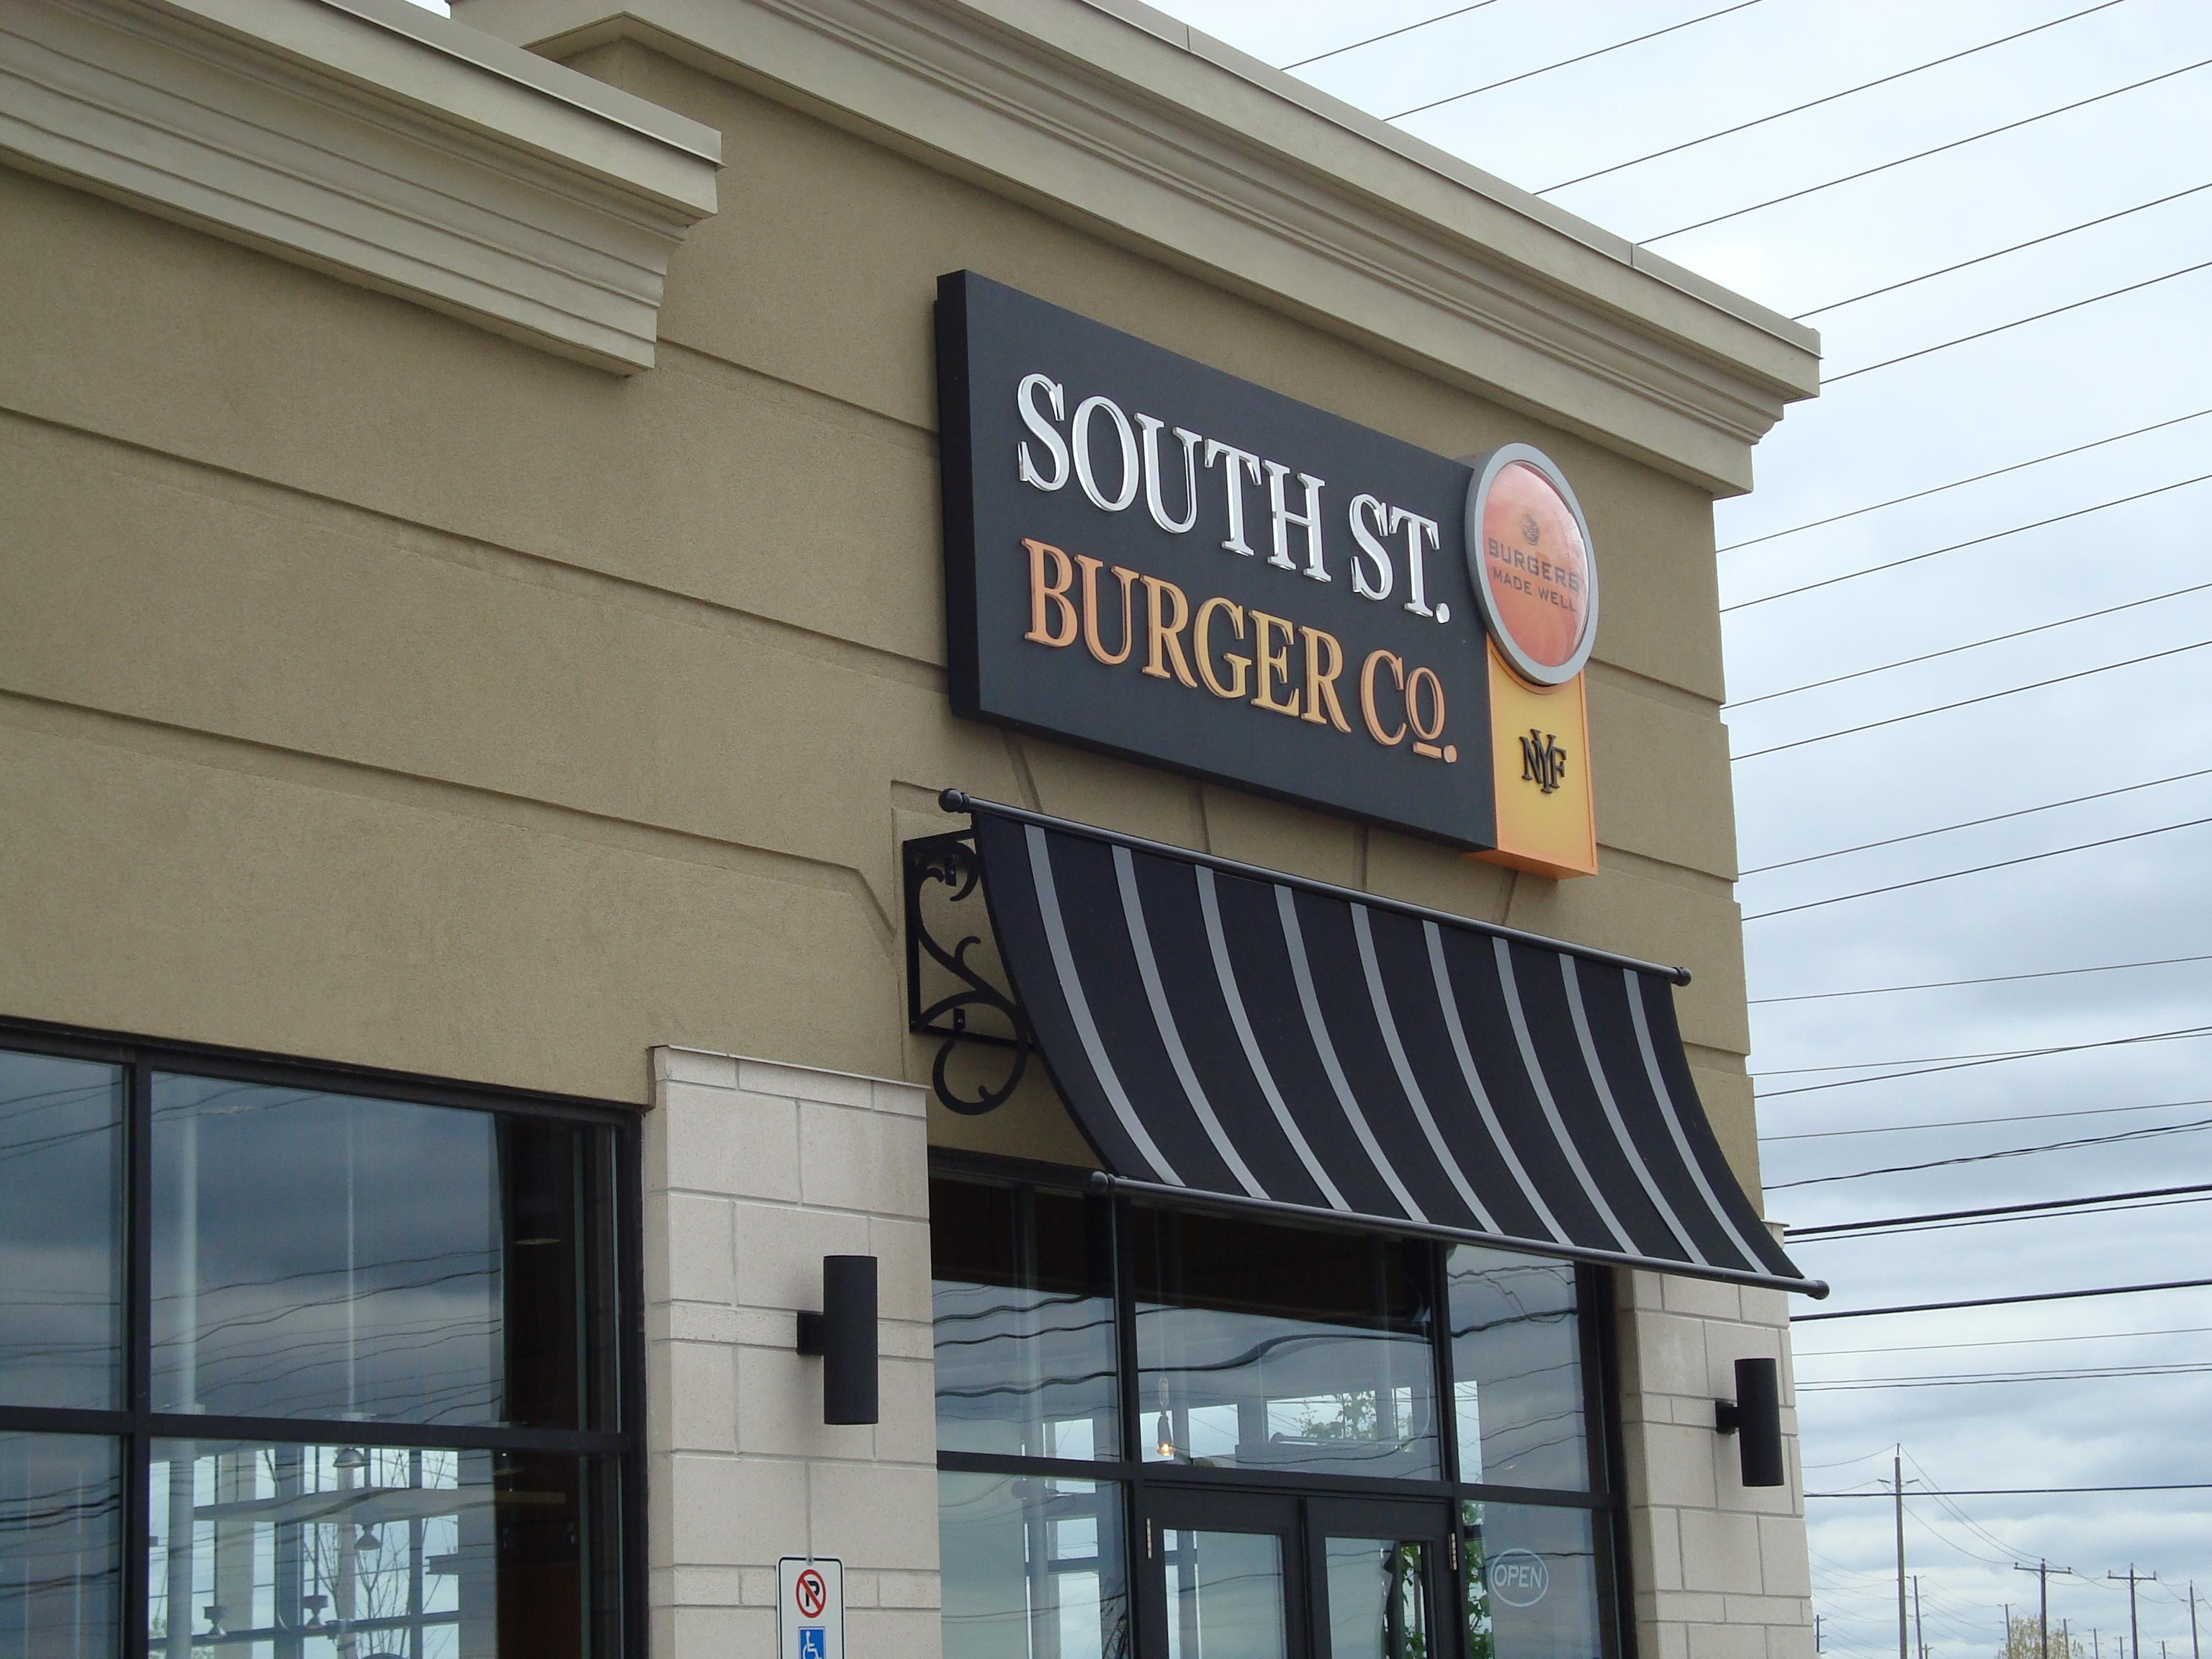 South St. Burger Co. |